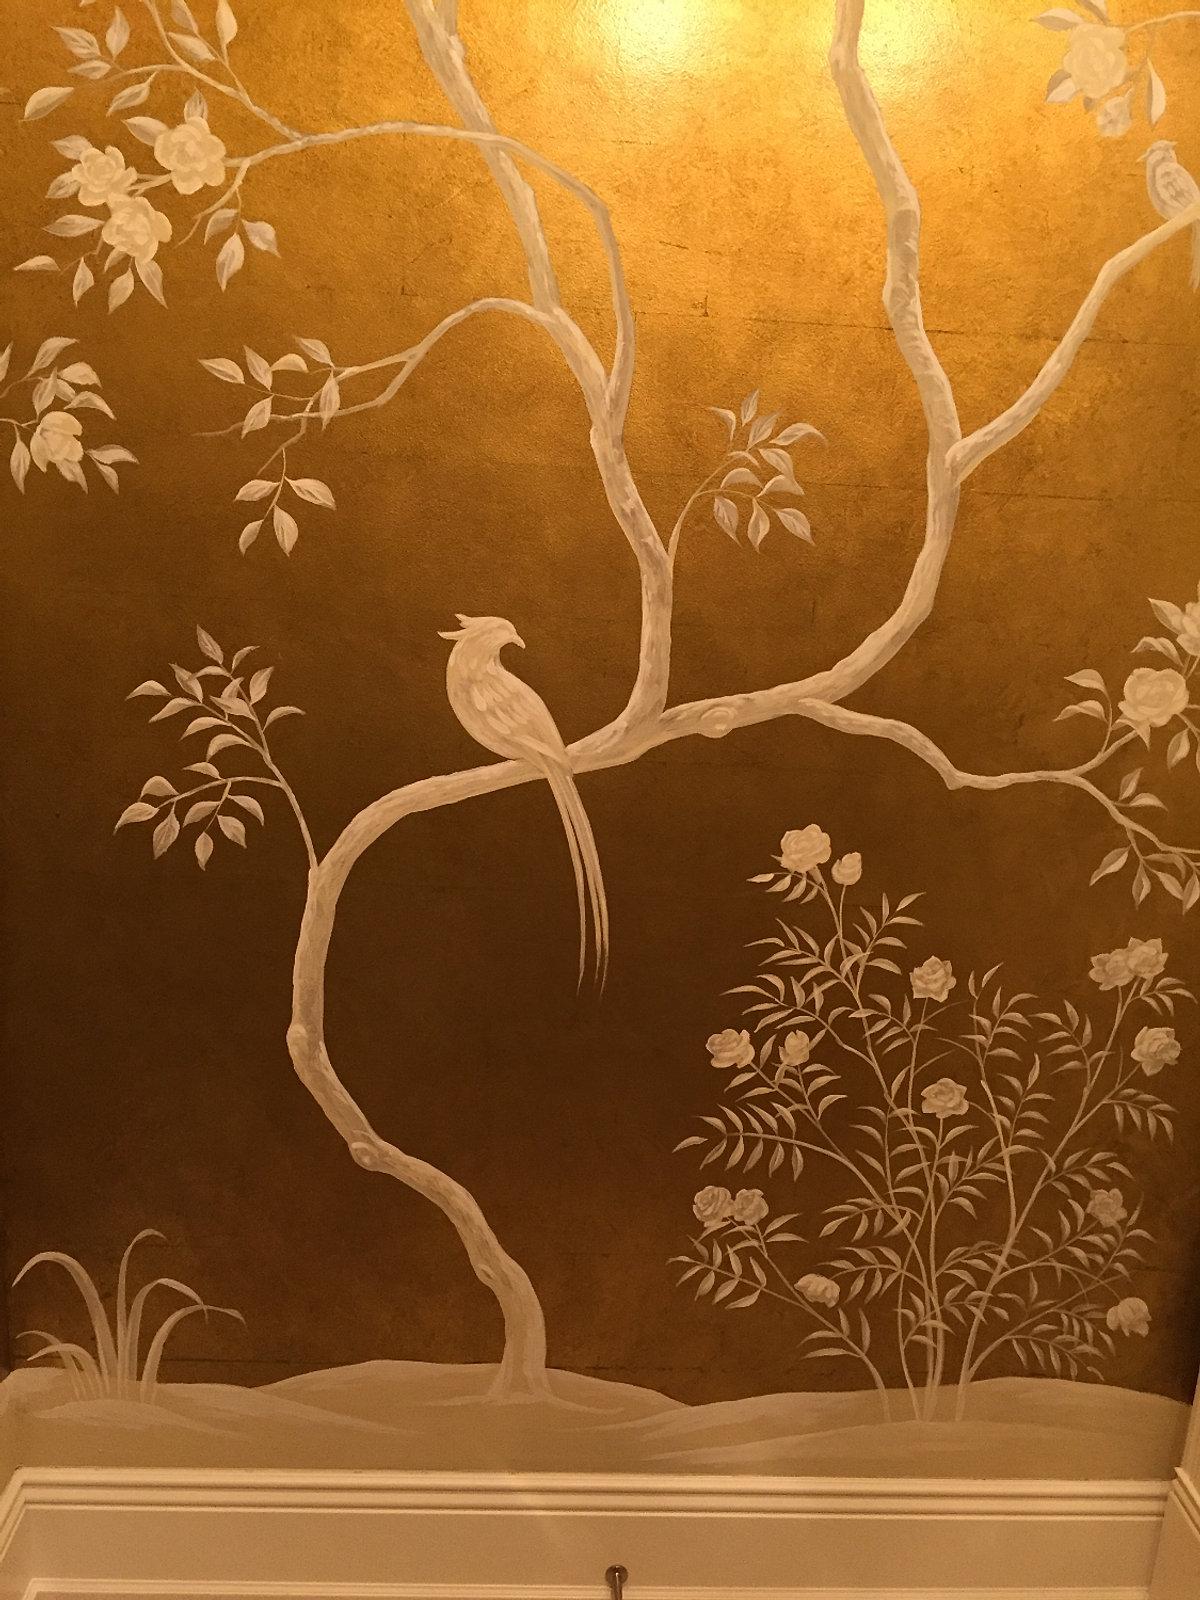 artisan rooms mural artist columbus ohio hand painted discs